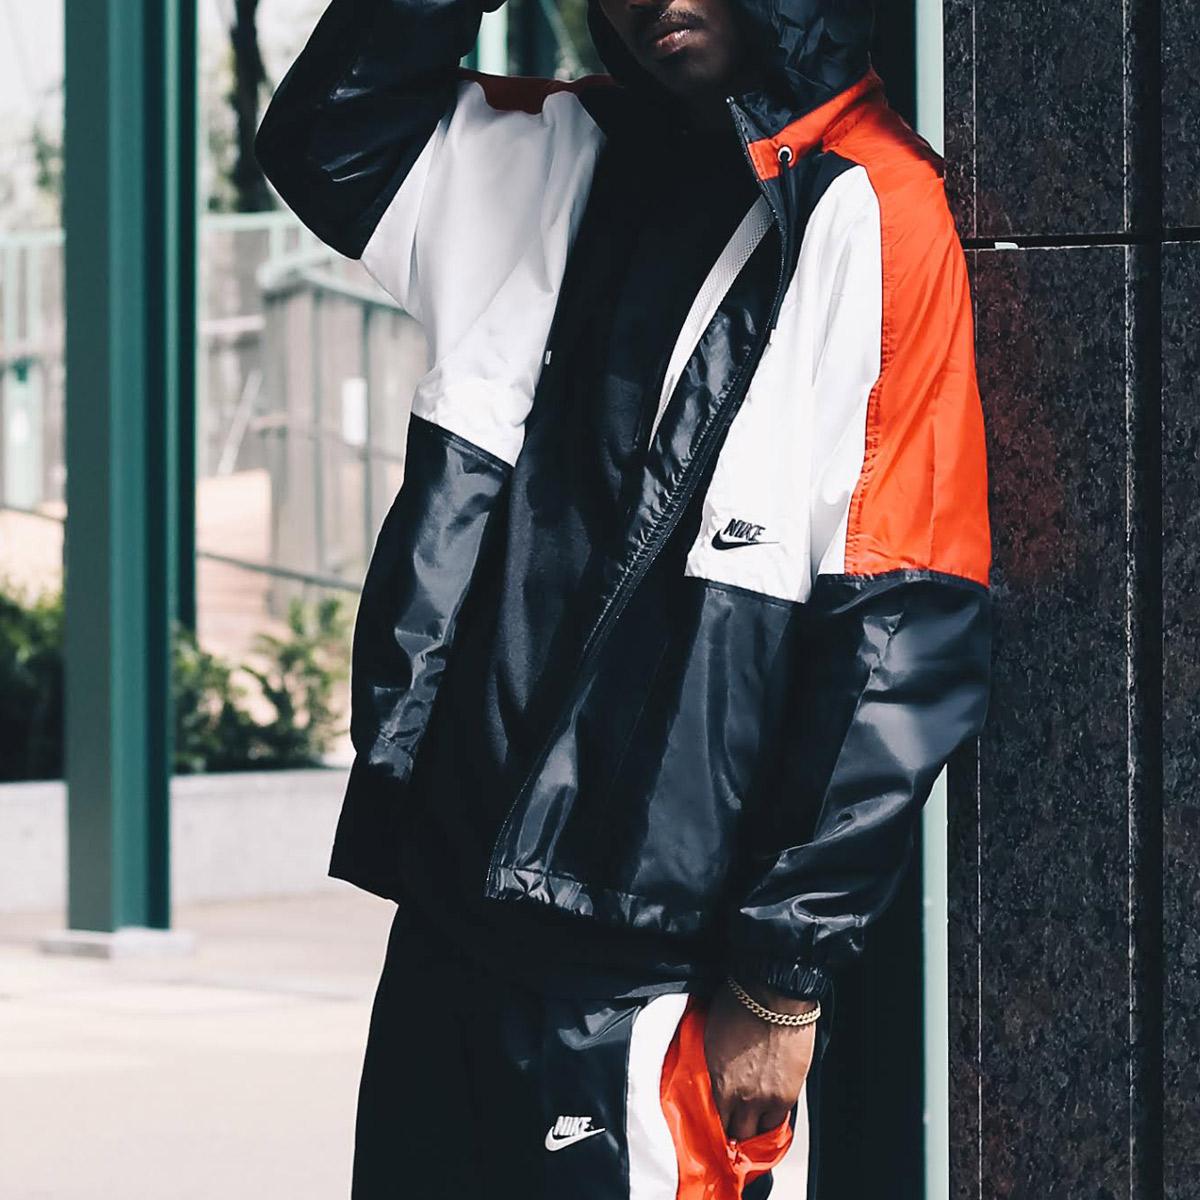 NIKE AS M NSW RE-ISSUE JKT WVN(ナイキ リ イシュー ウーブン ジャケット)BLACK/UNIVERSITY RED/SUMMIT WHITE/BLACK【メンズ ジャケット】18HO-S